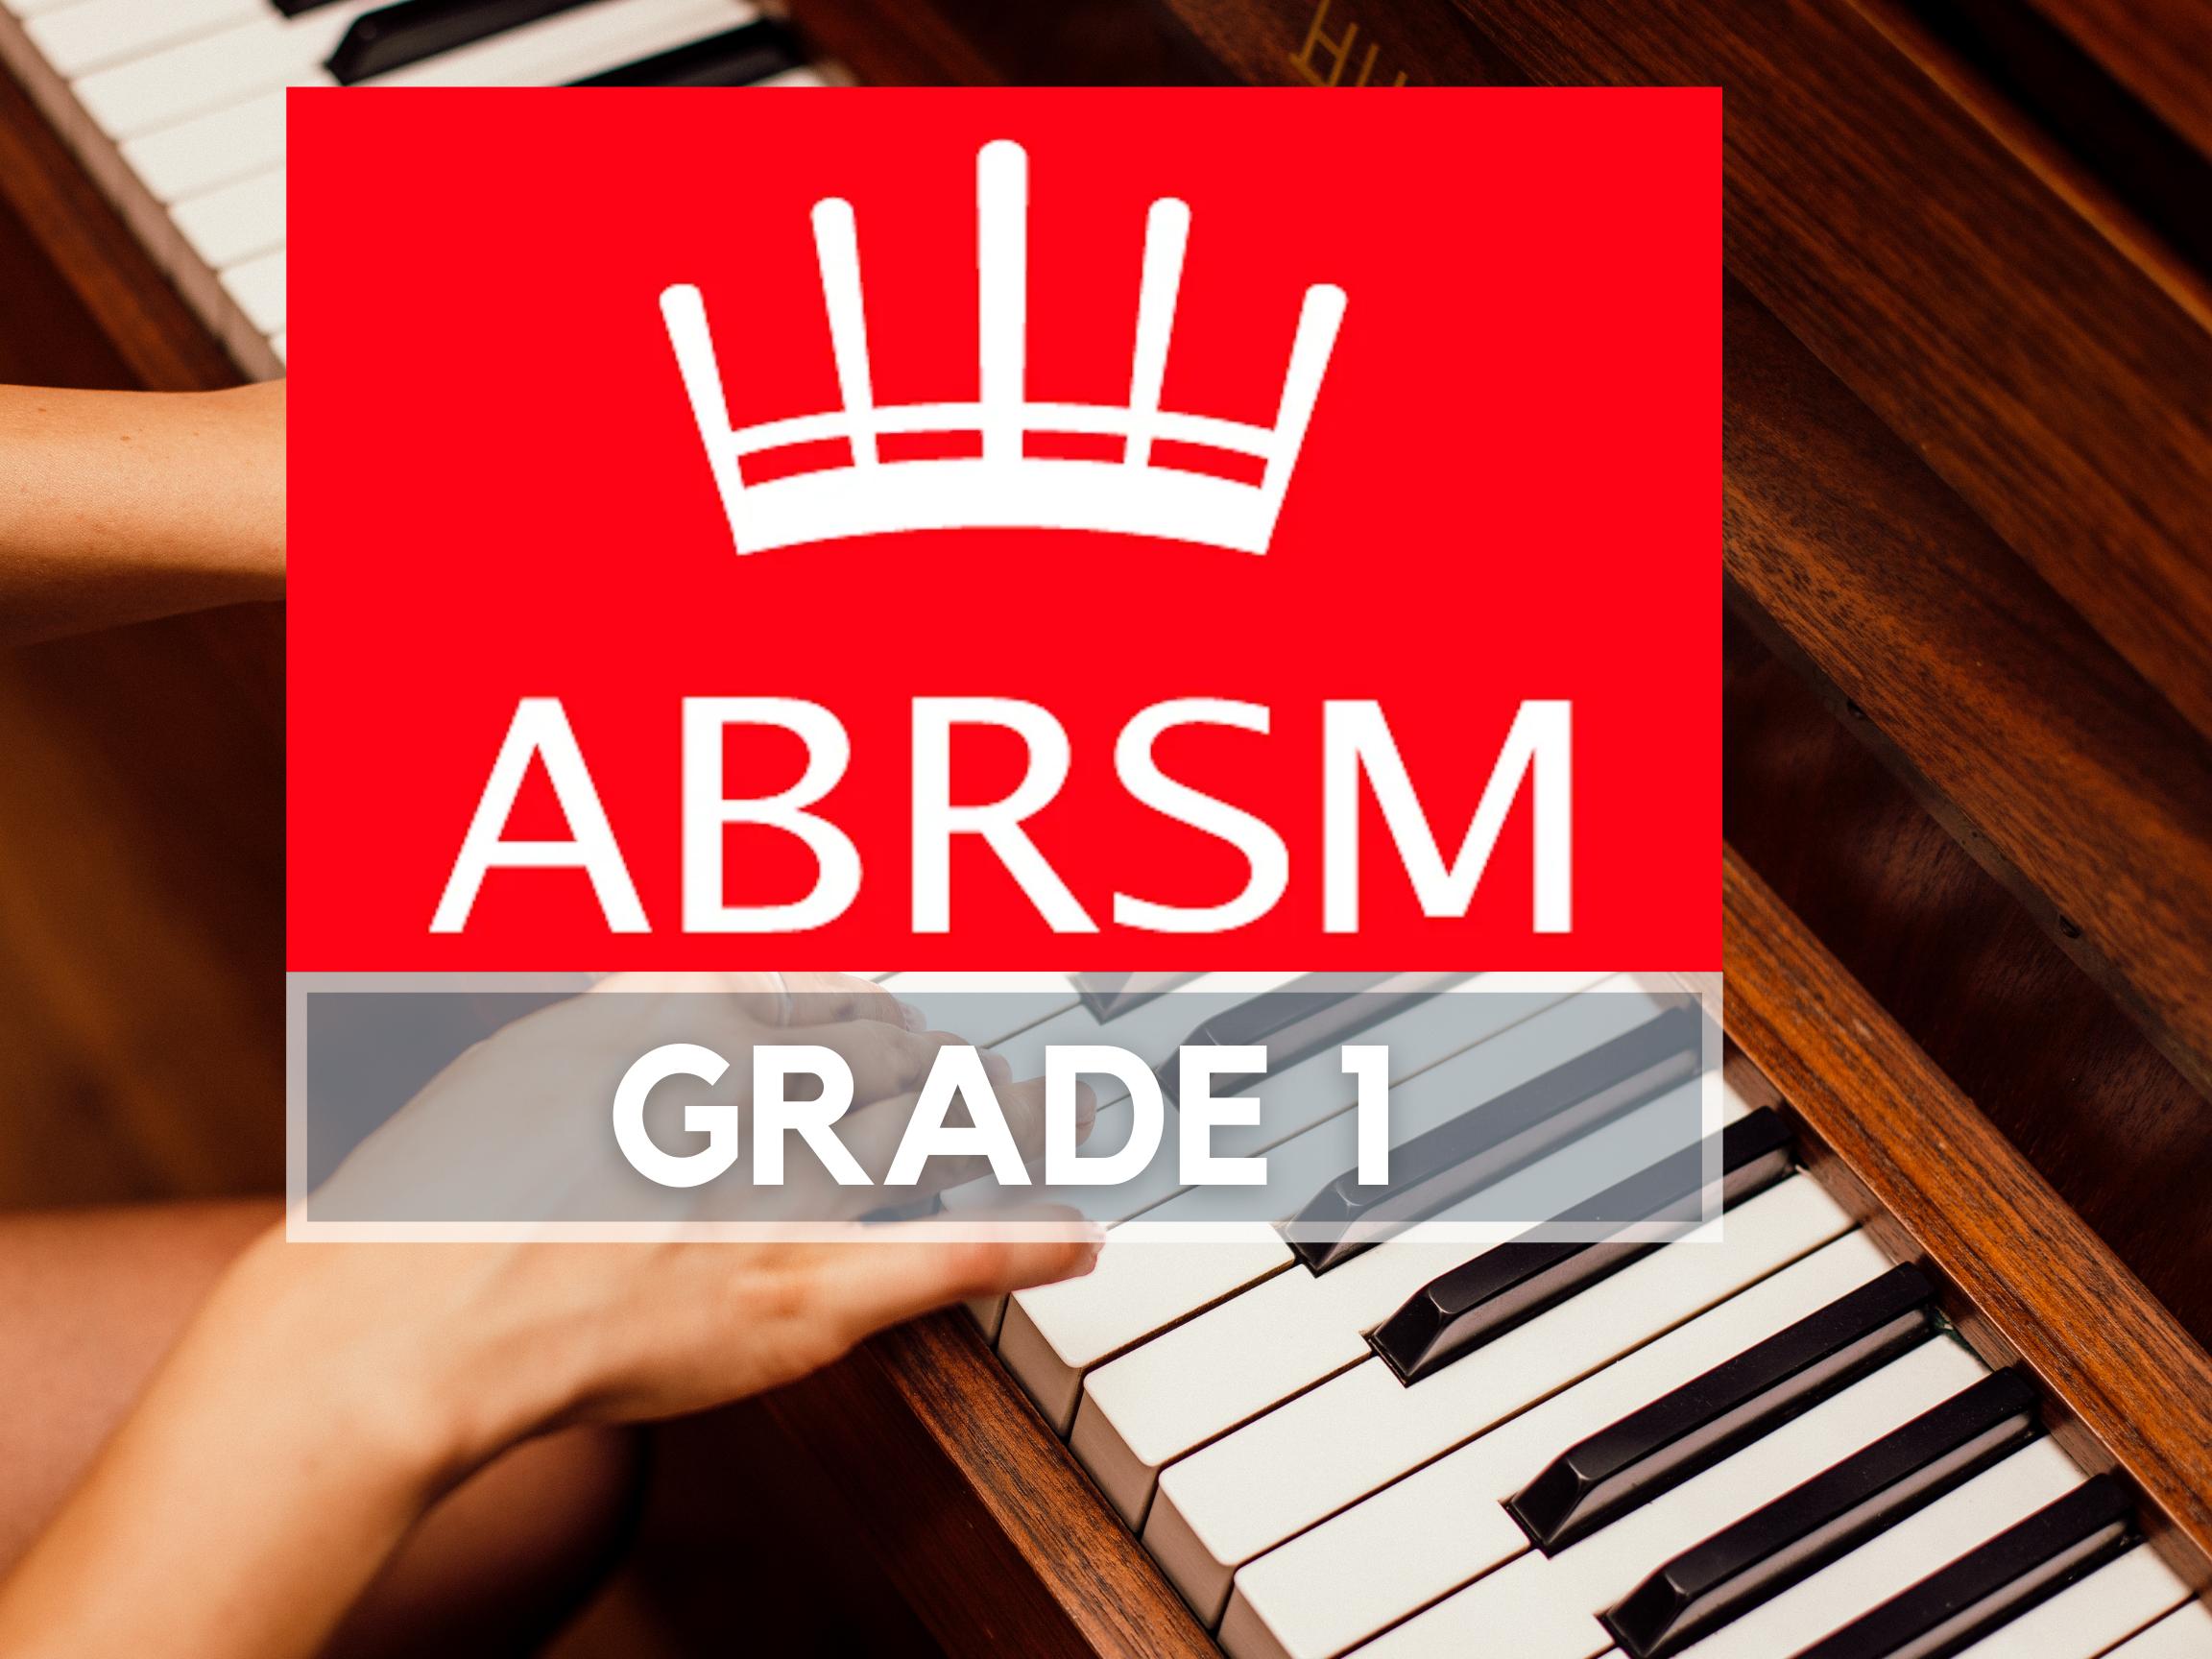 Piano ABRSM Grade1 Programme (16 Lessons)